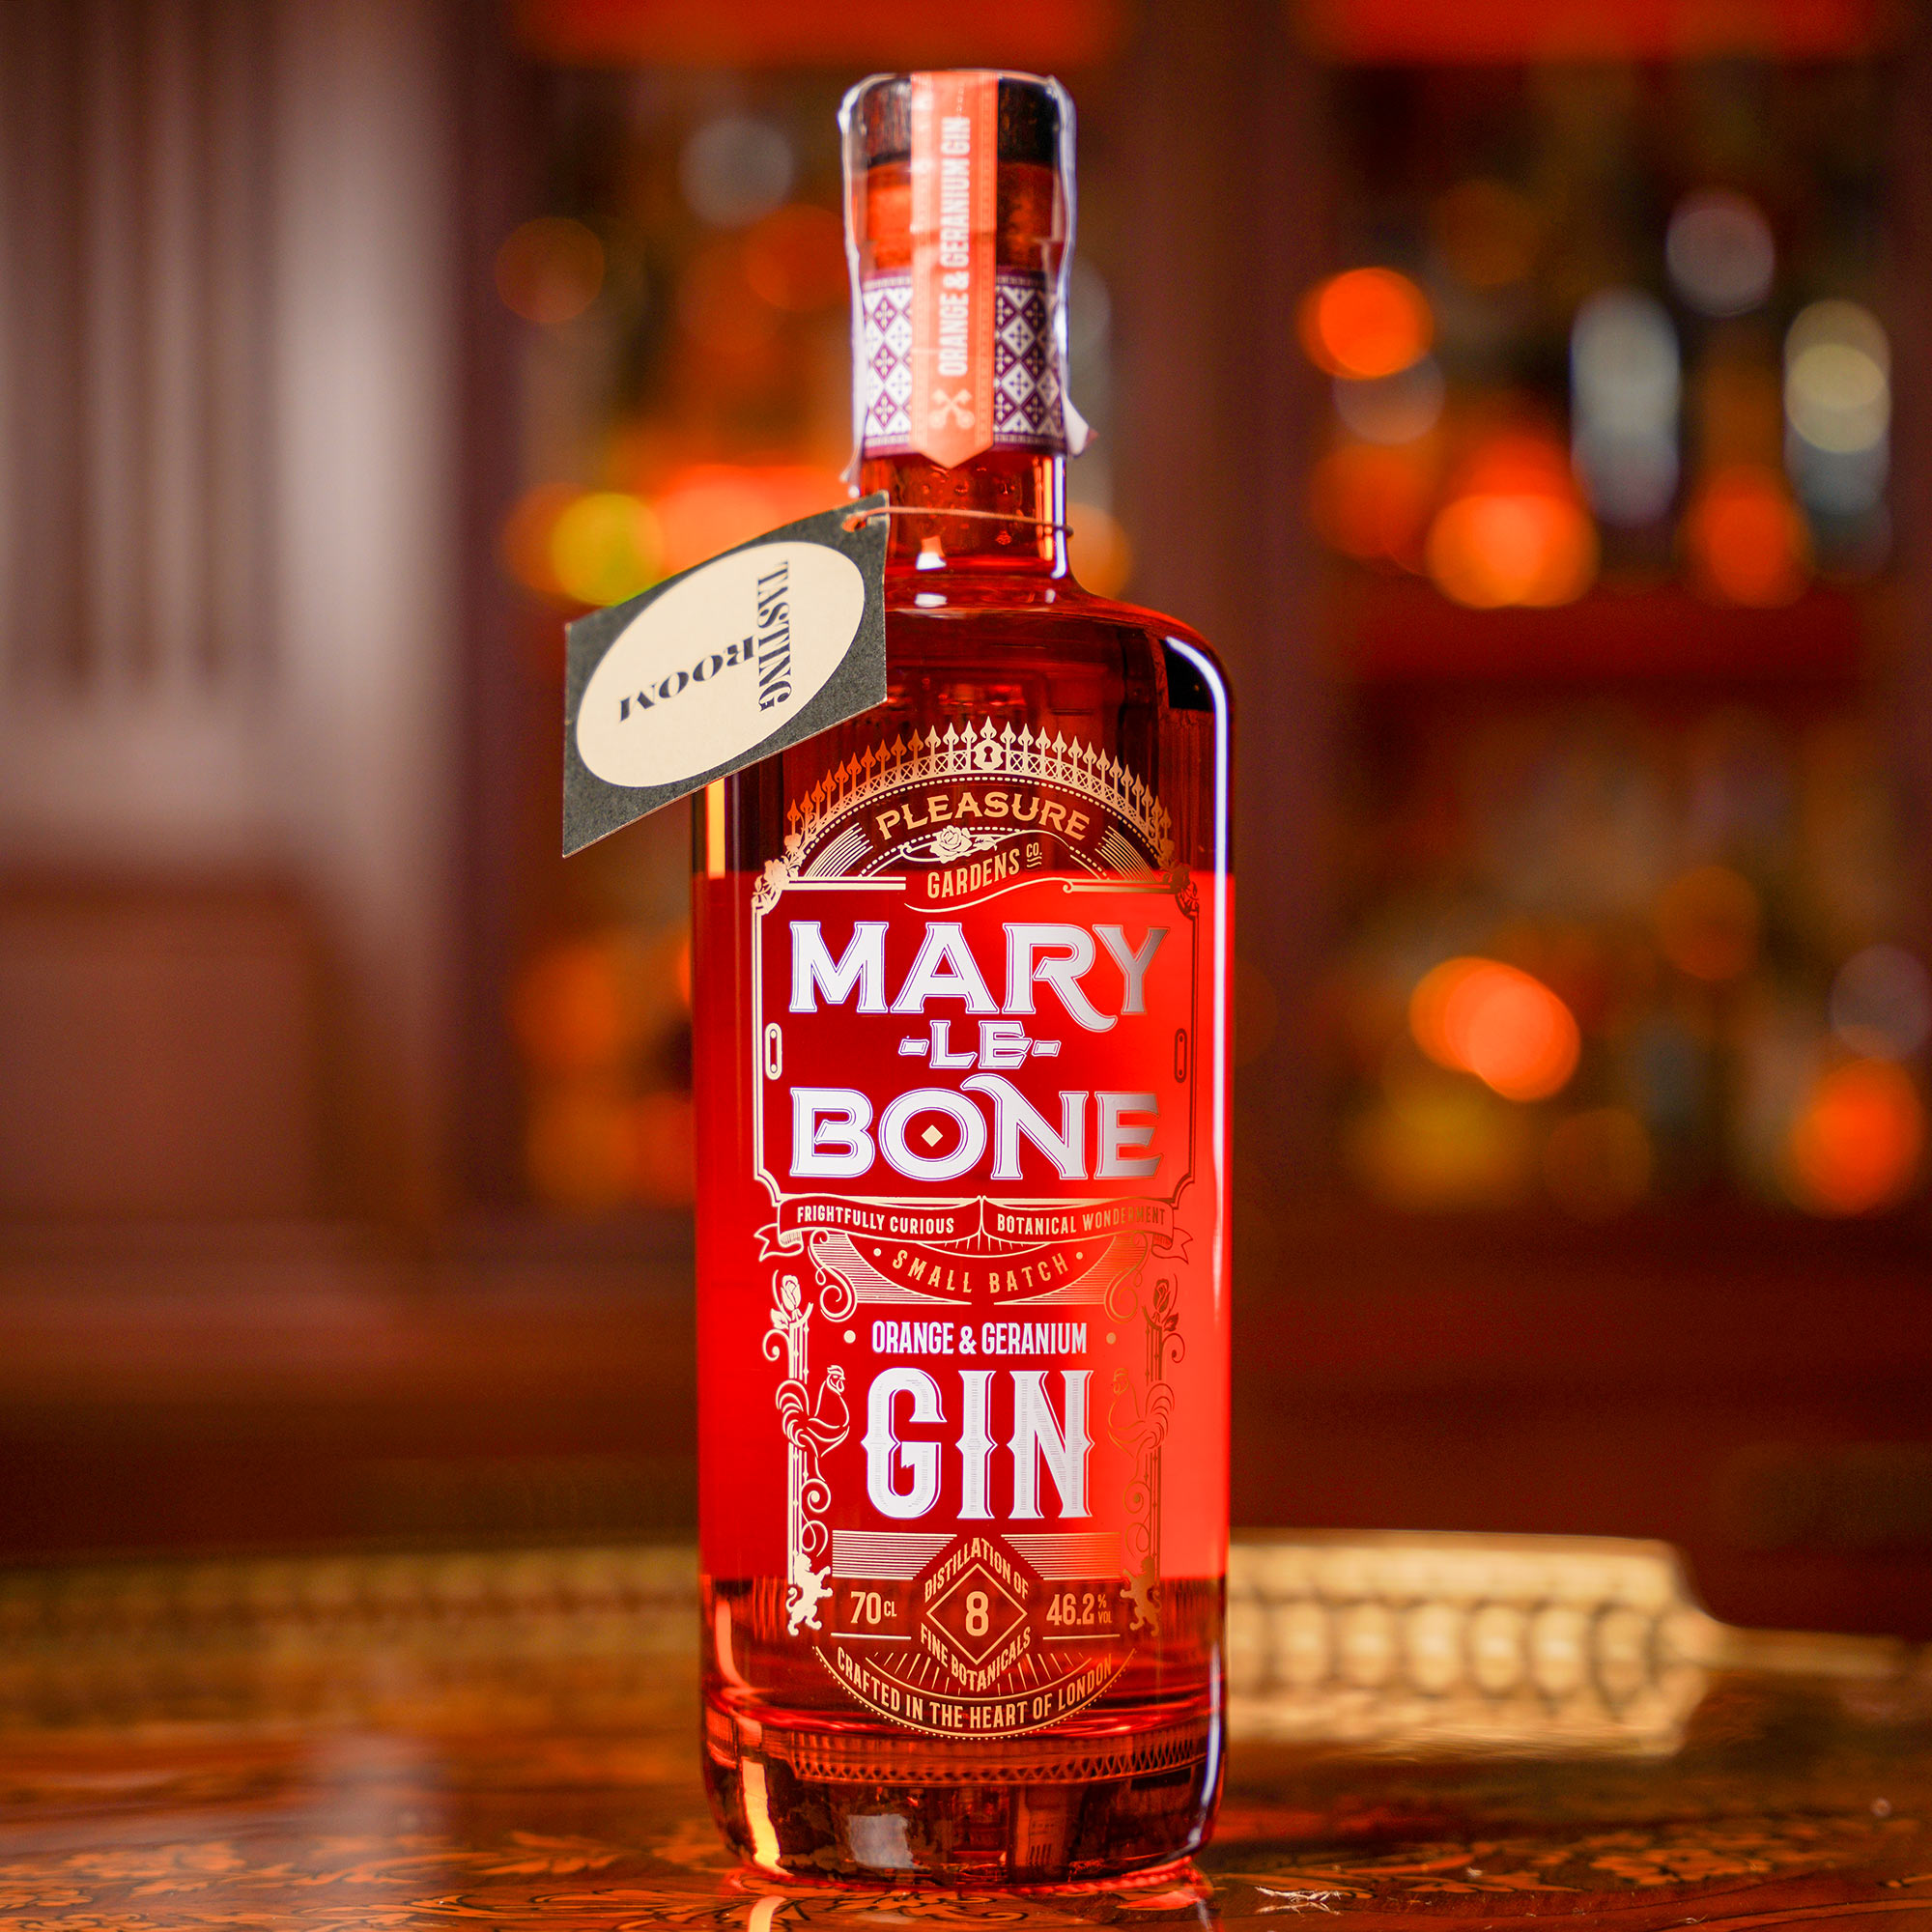 Marylebone Orange and Geranium Gin /Джин Мери ле Бон Портокал и Здравец